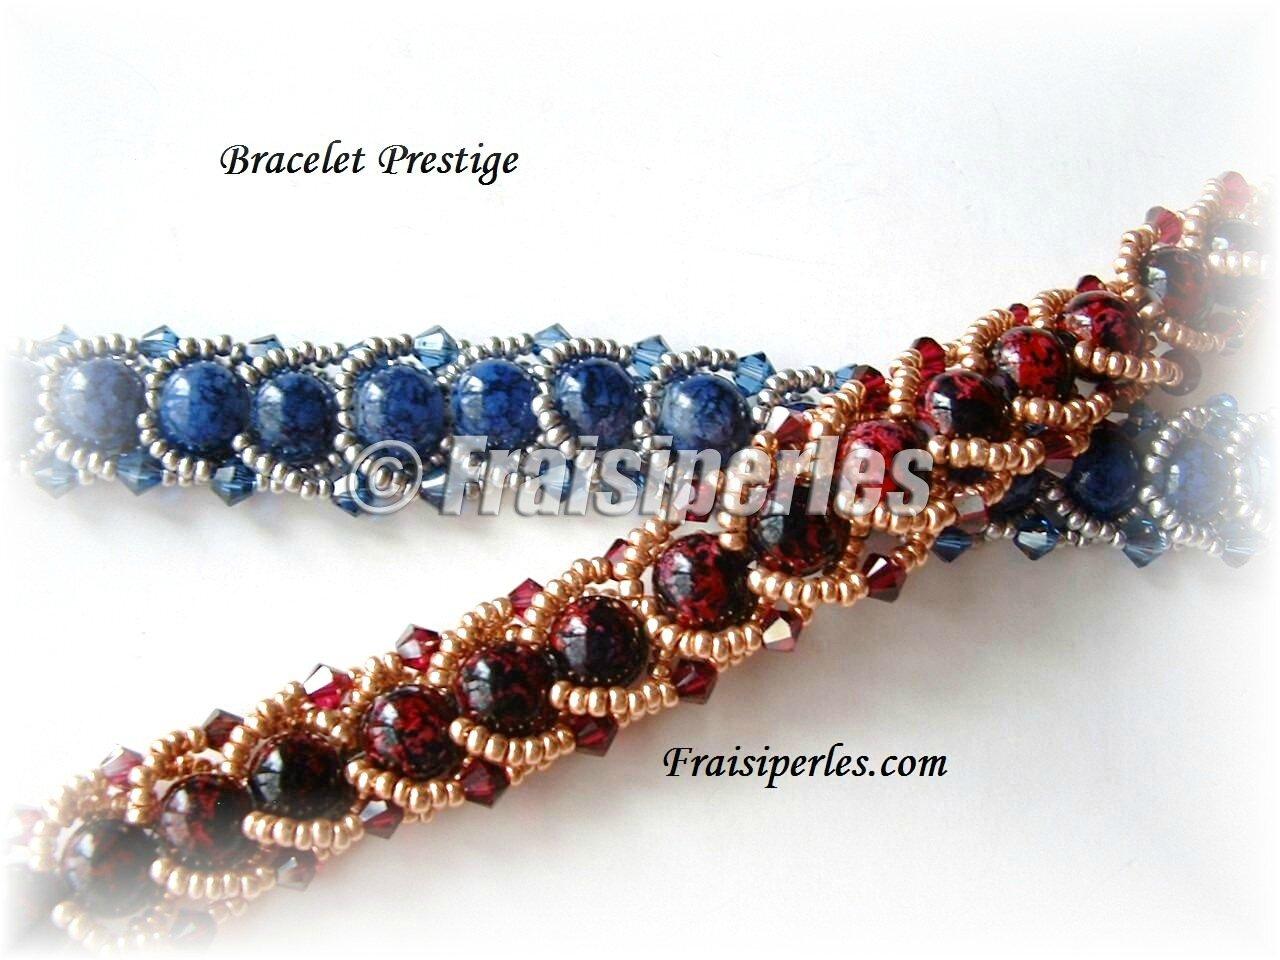 bracelet prestige bleu et rouge copy